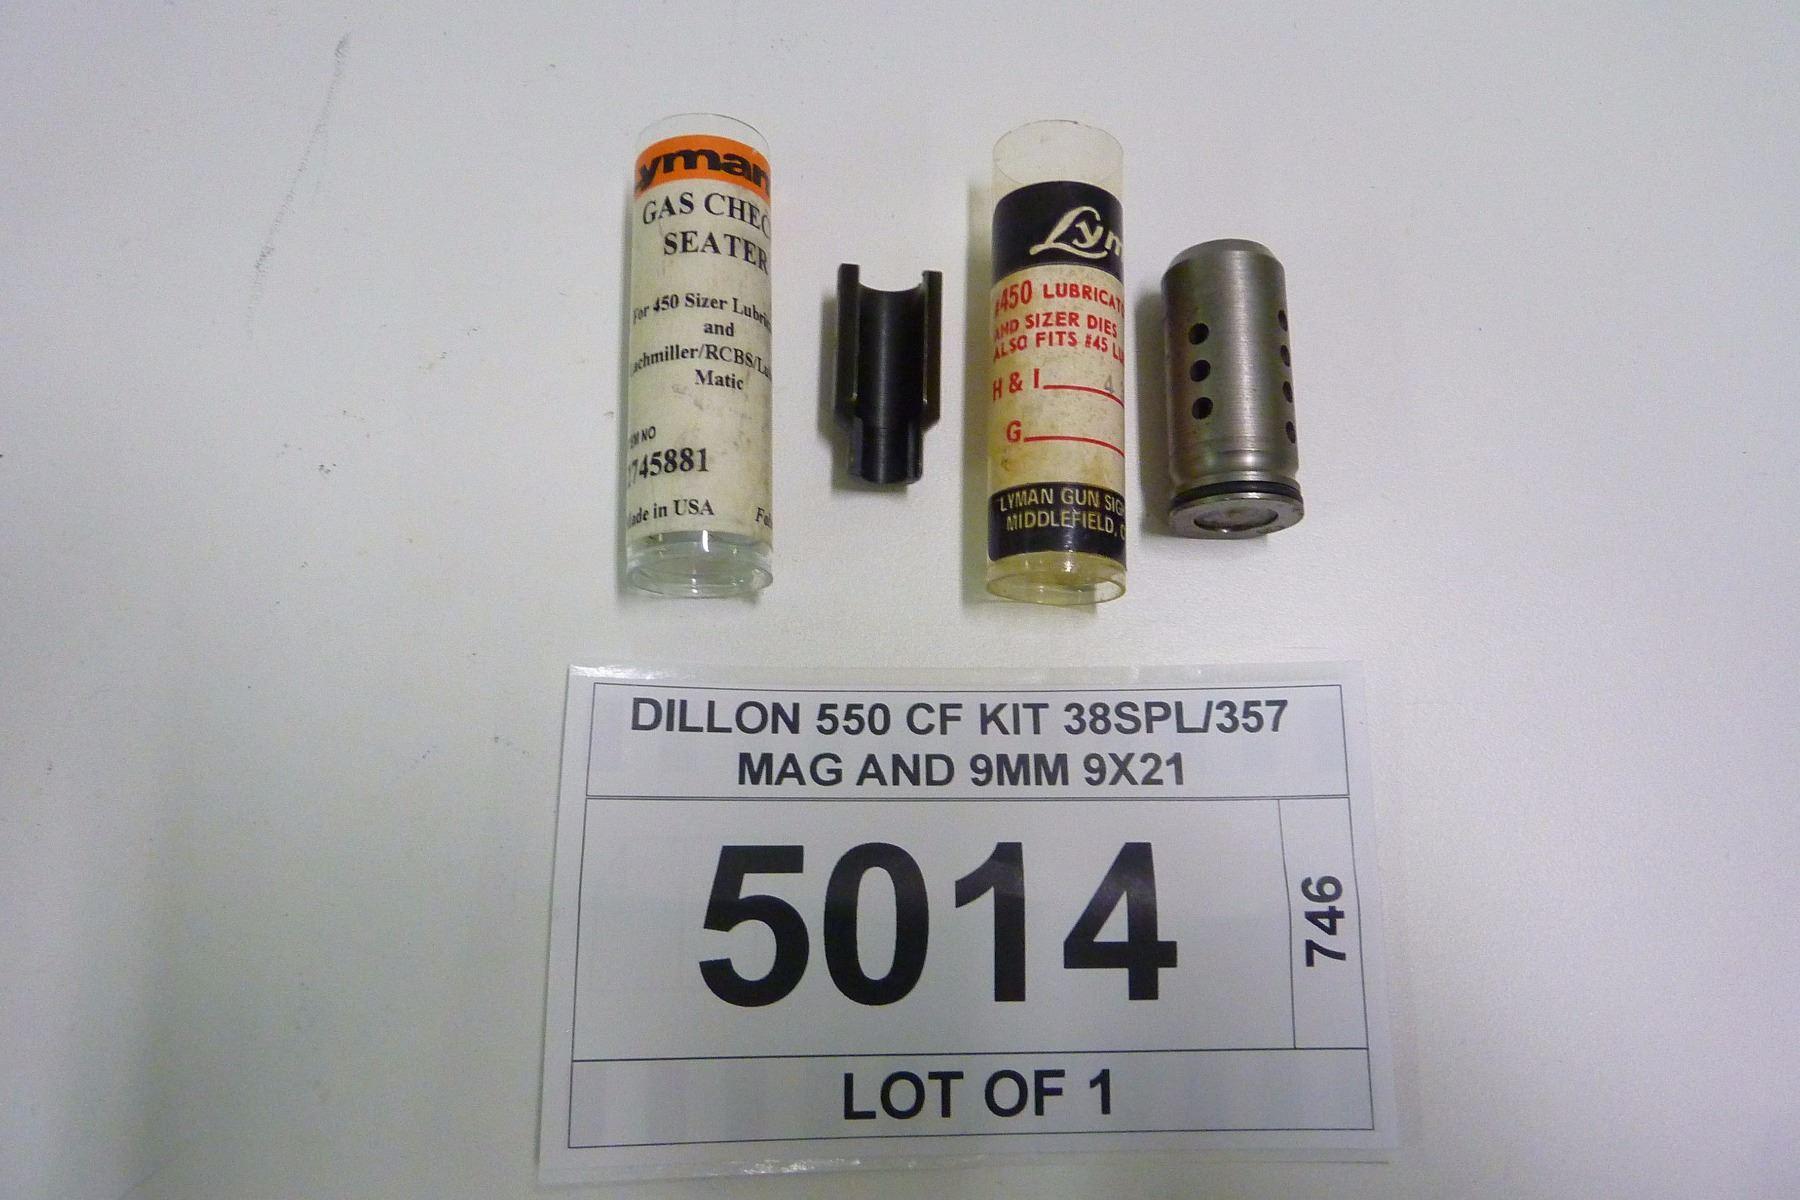 DILLON 550 CF KIT 38SPL/357 MAG AND 9MM 9X21